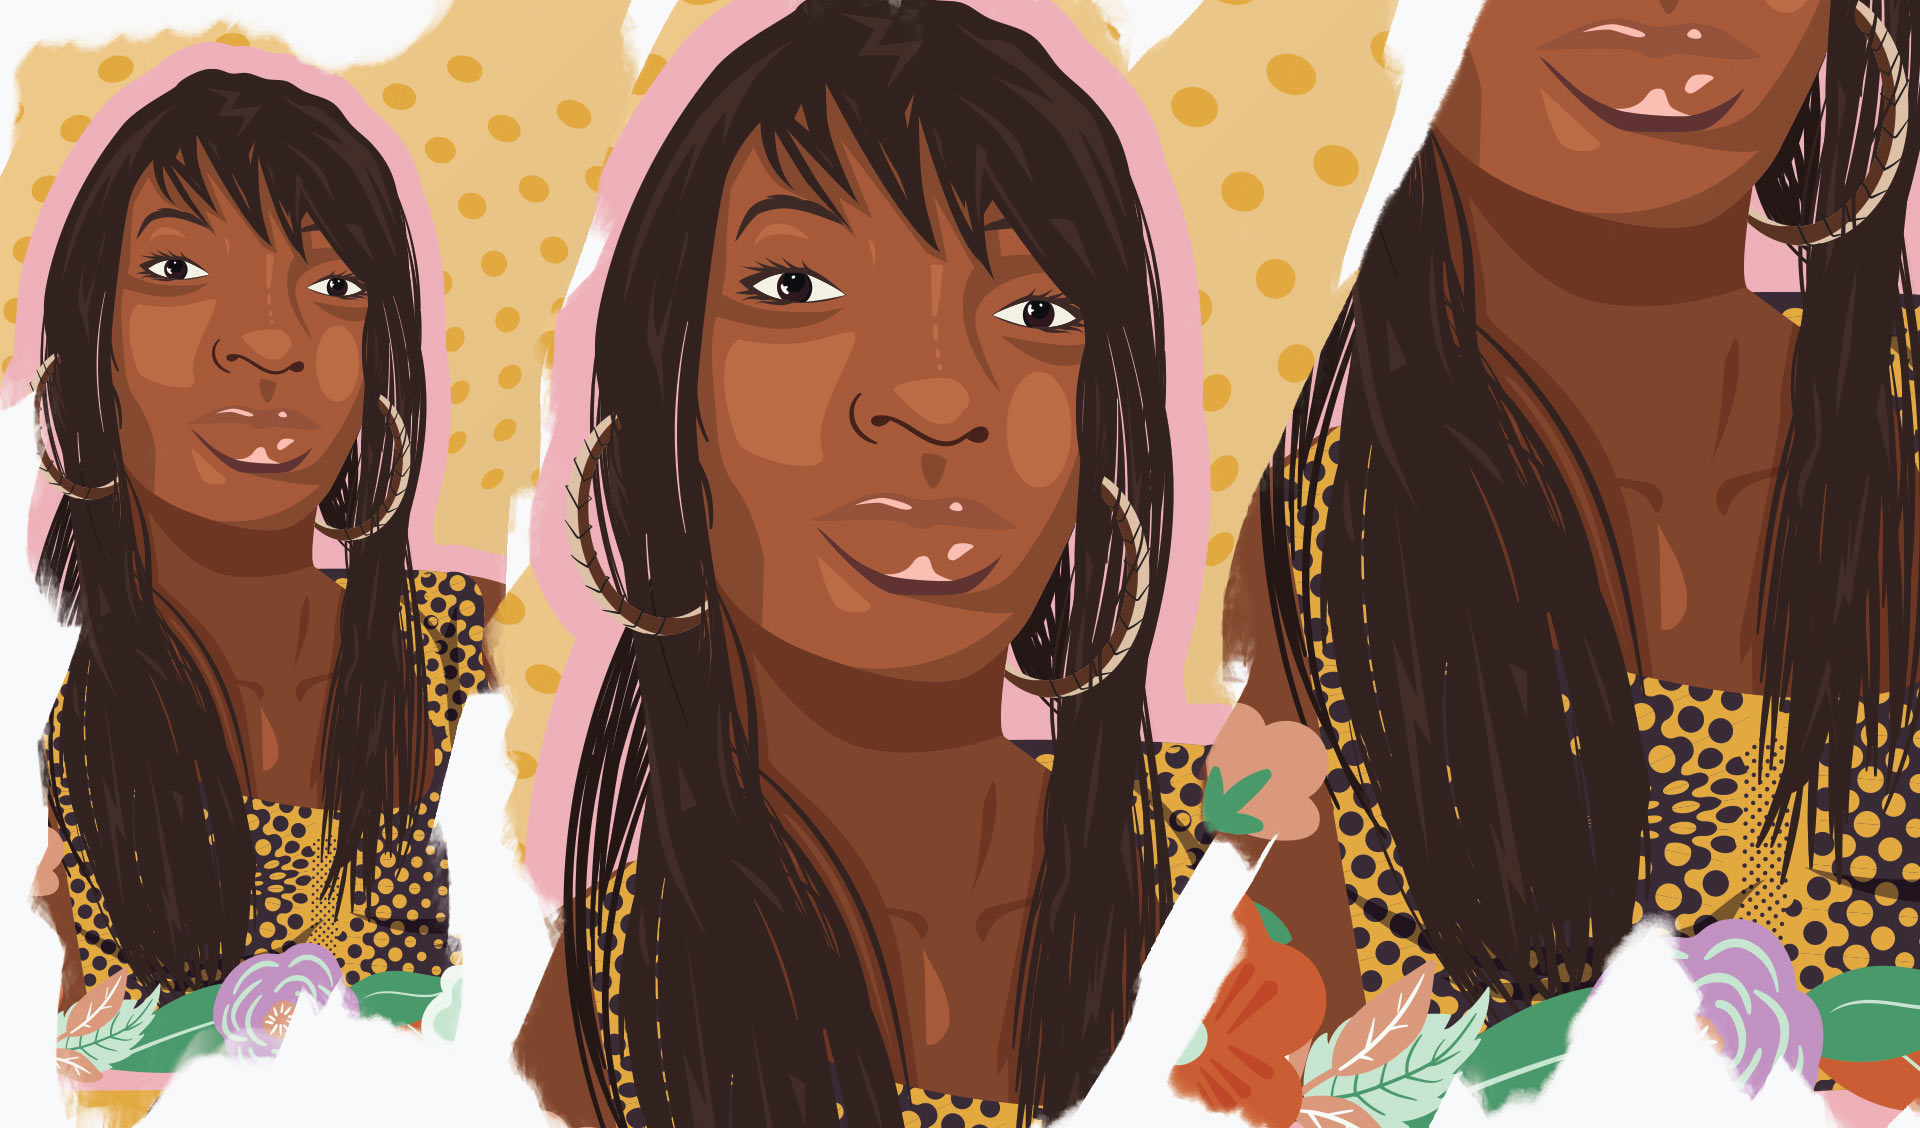 Charleena Lyles illustration details.